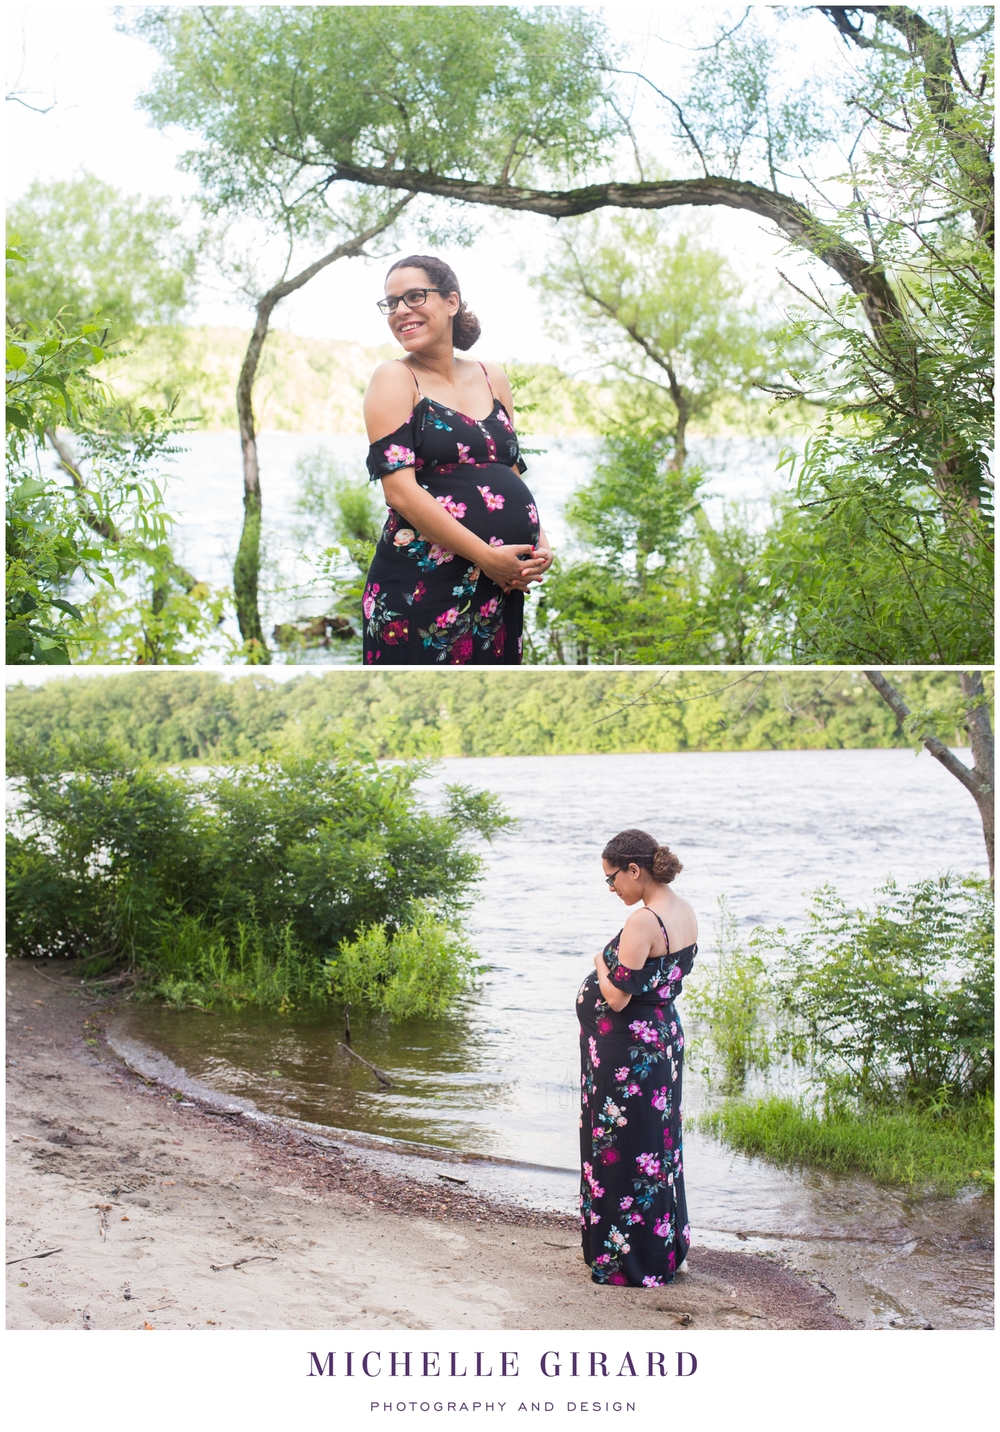 MaternitySession_BabyBump_MichelleGirardPhotography02.jpg